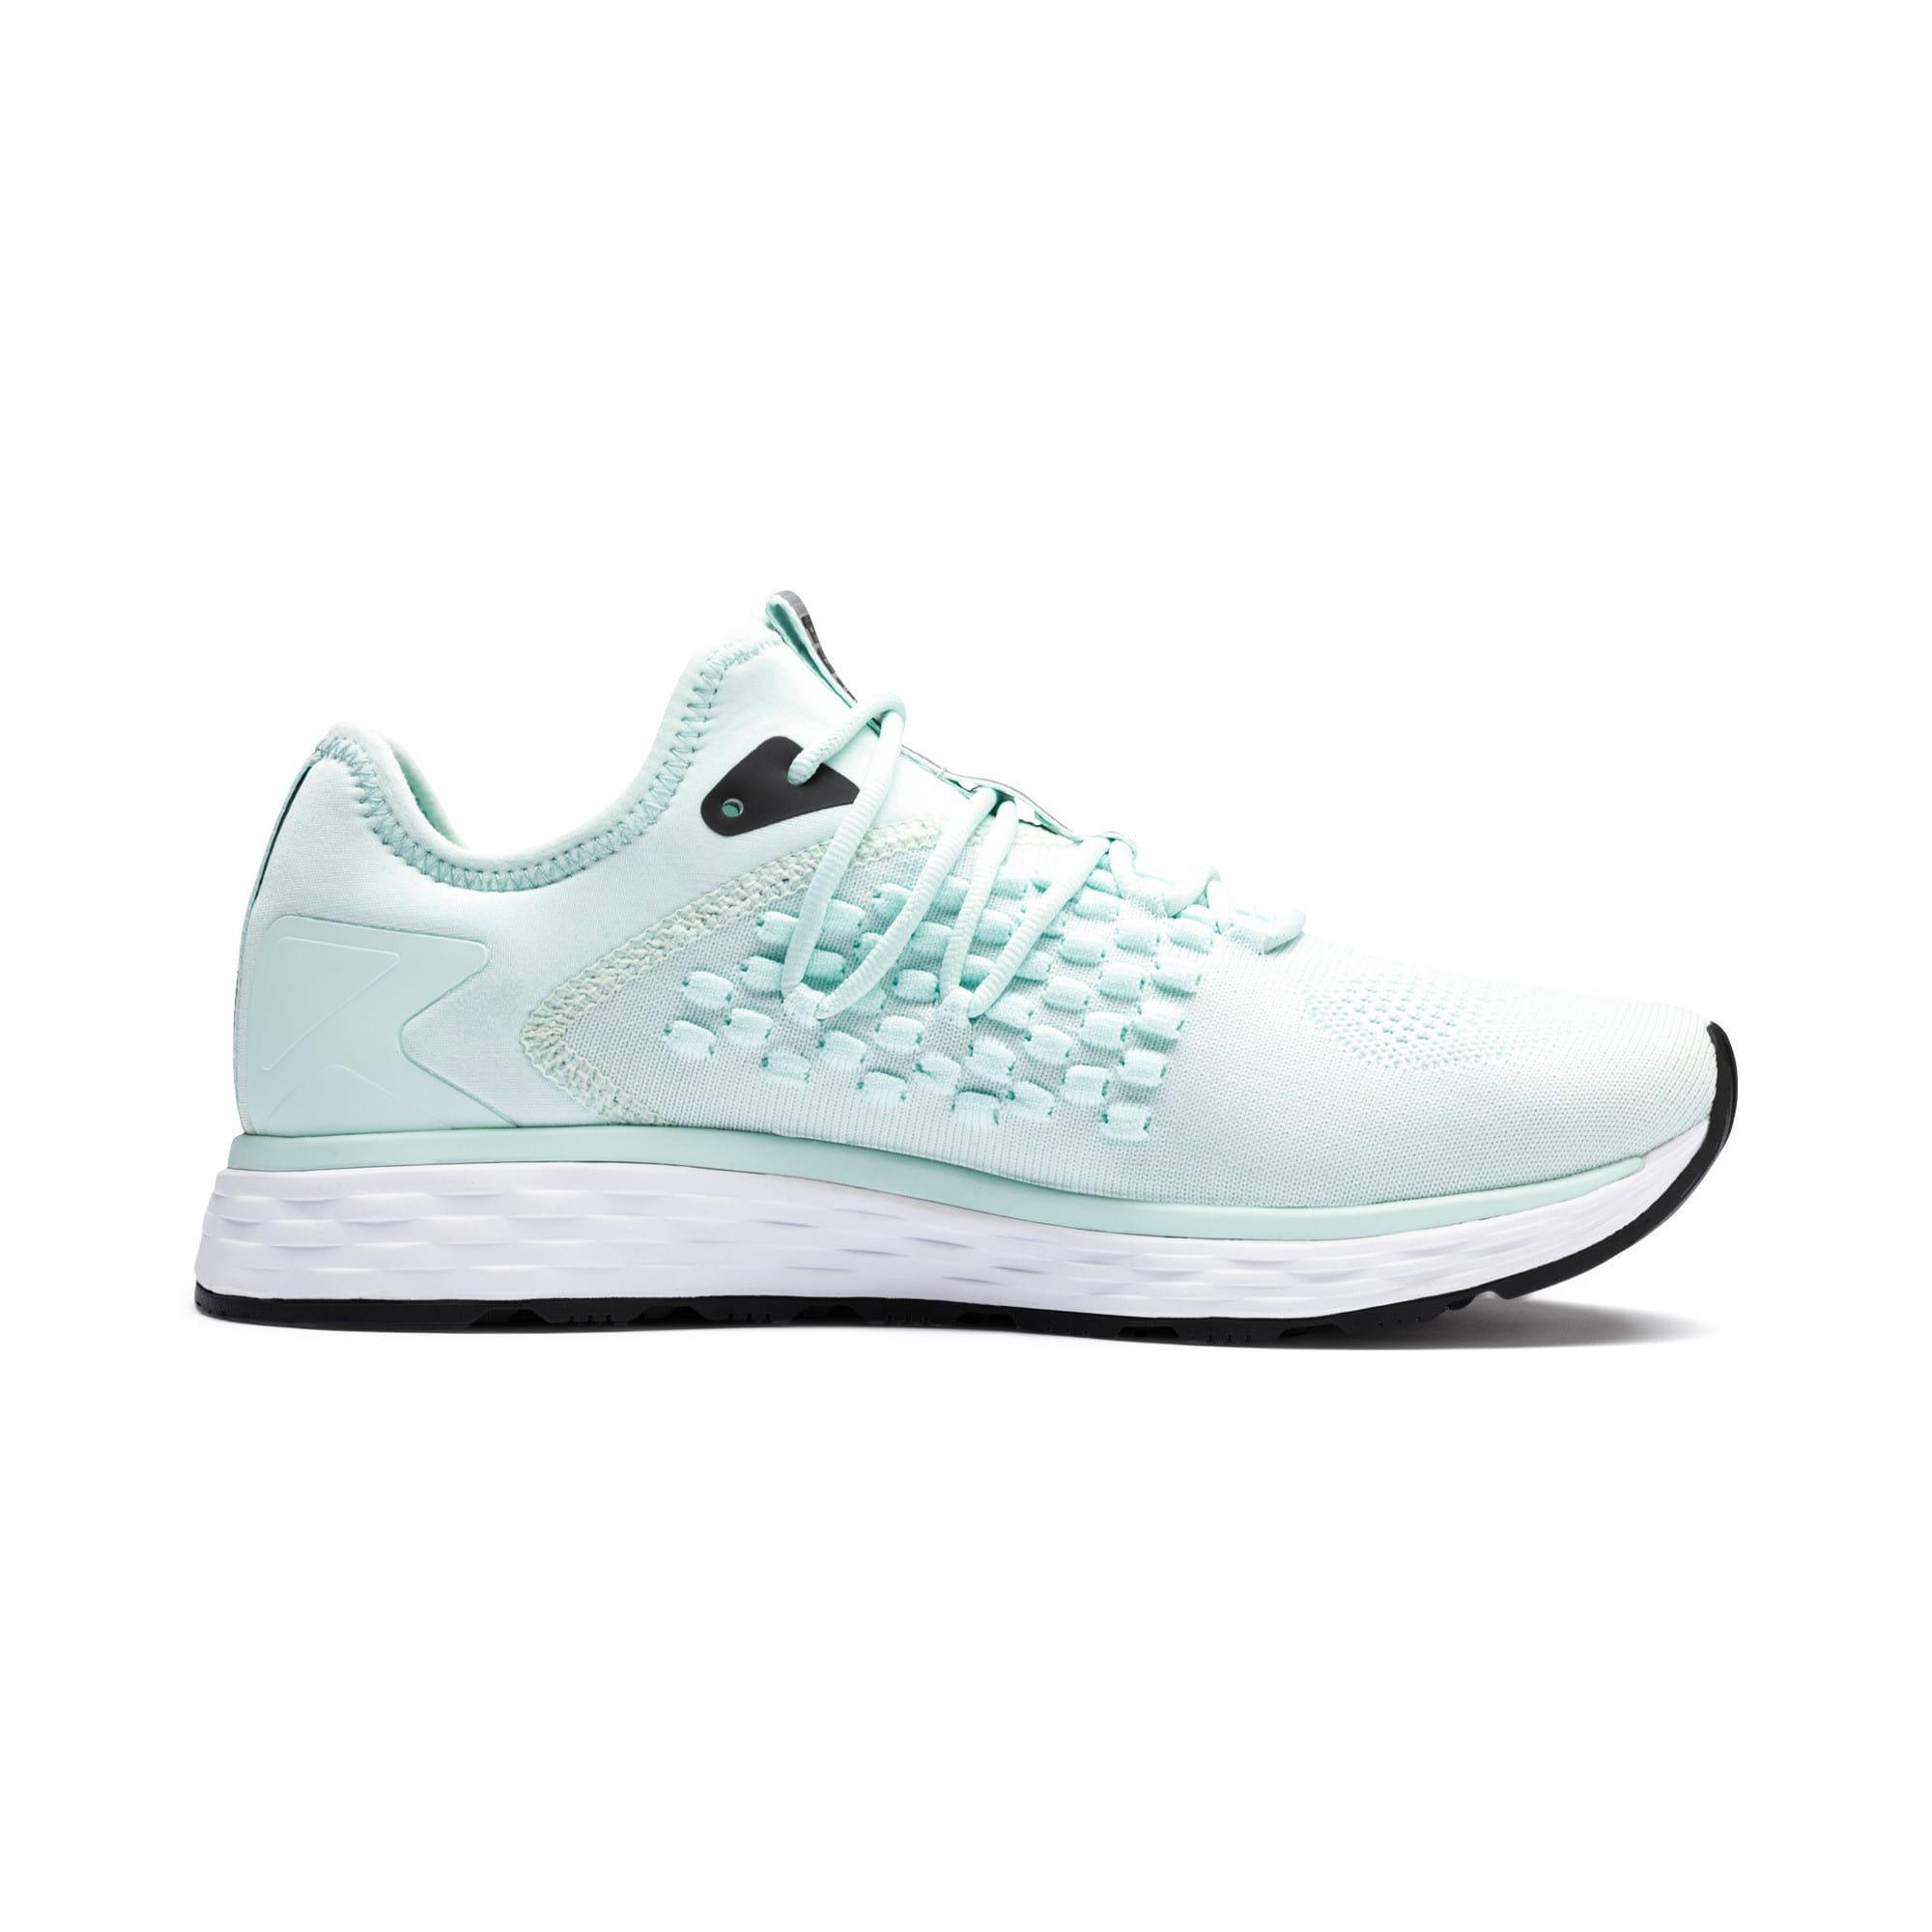 Thumbnail 6 of SPEED FUSEFIT Women's Running Shoes, Fair Aqua-Puma White, medium-IND